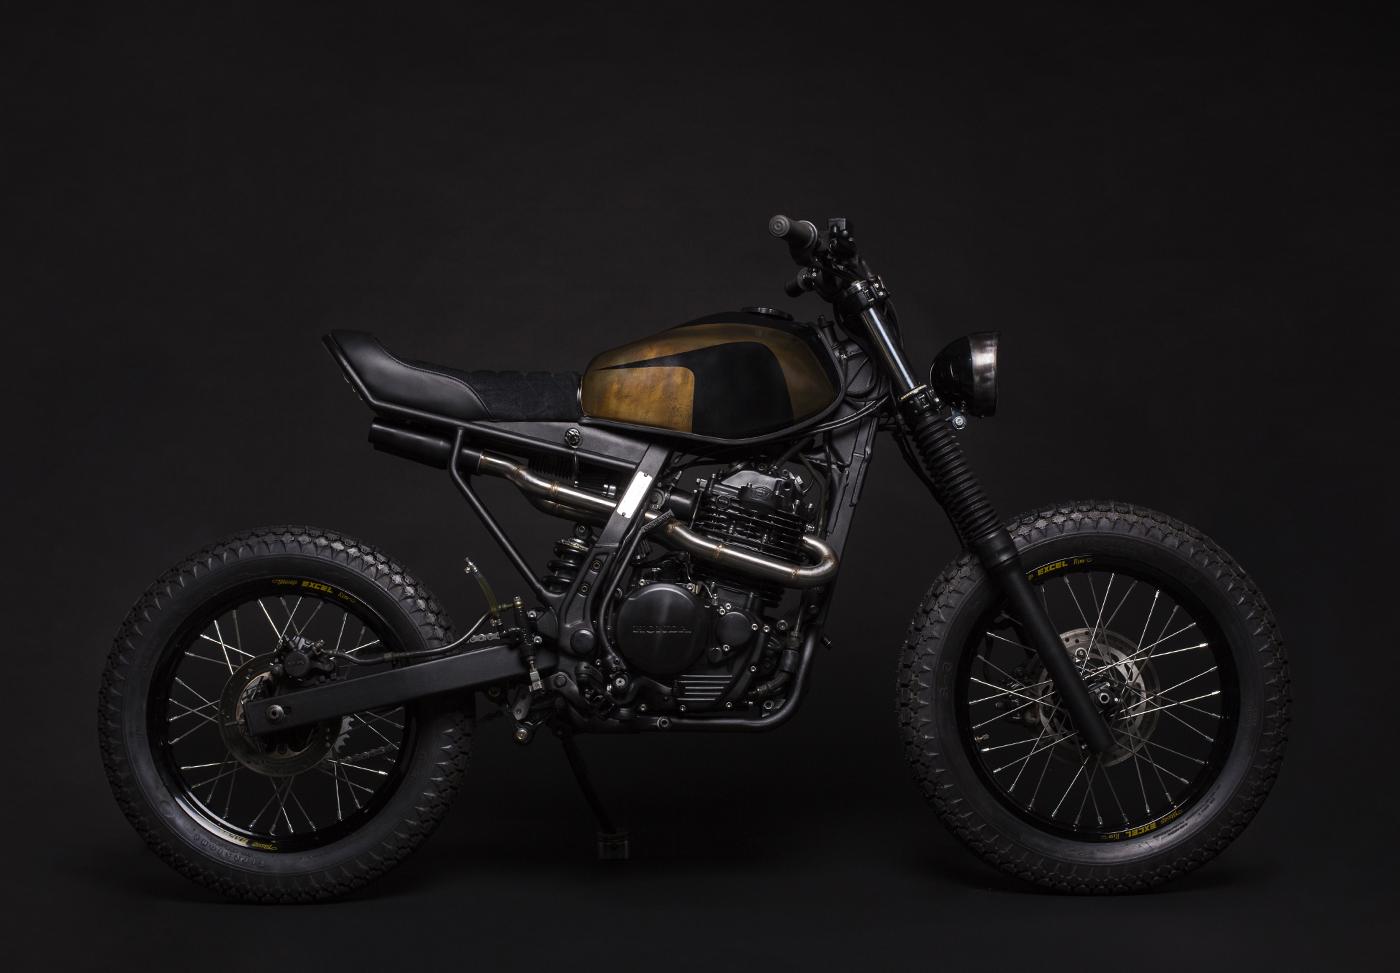 moto honda nx 650 dominator scrambler cafe racer préparation ATELIER MEDUSA